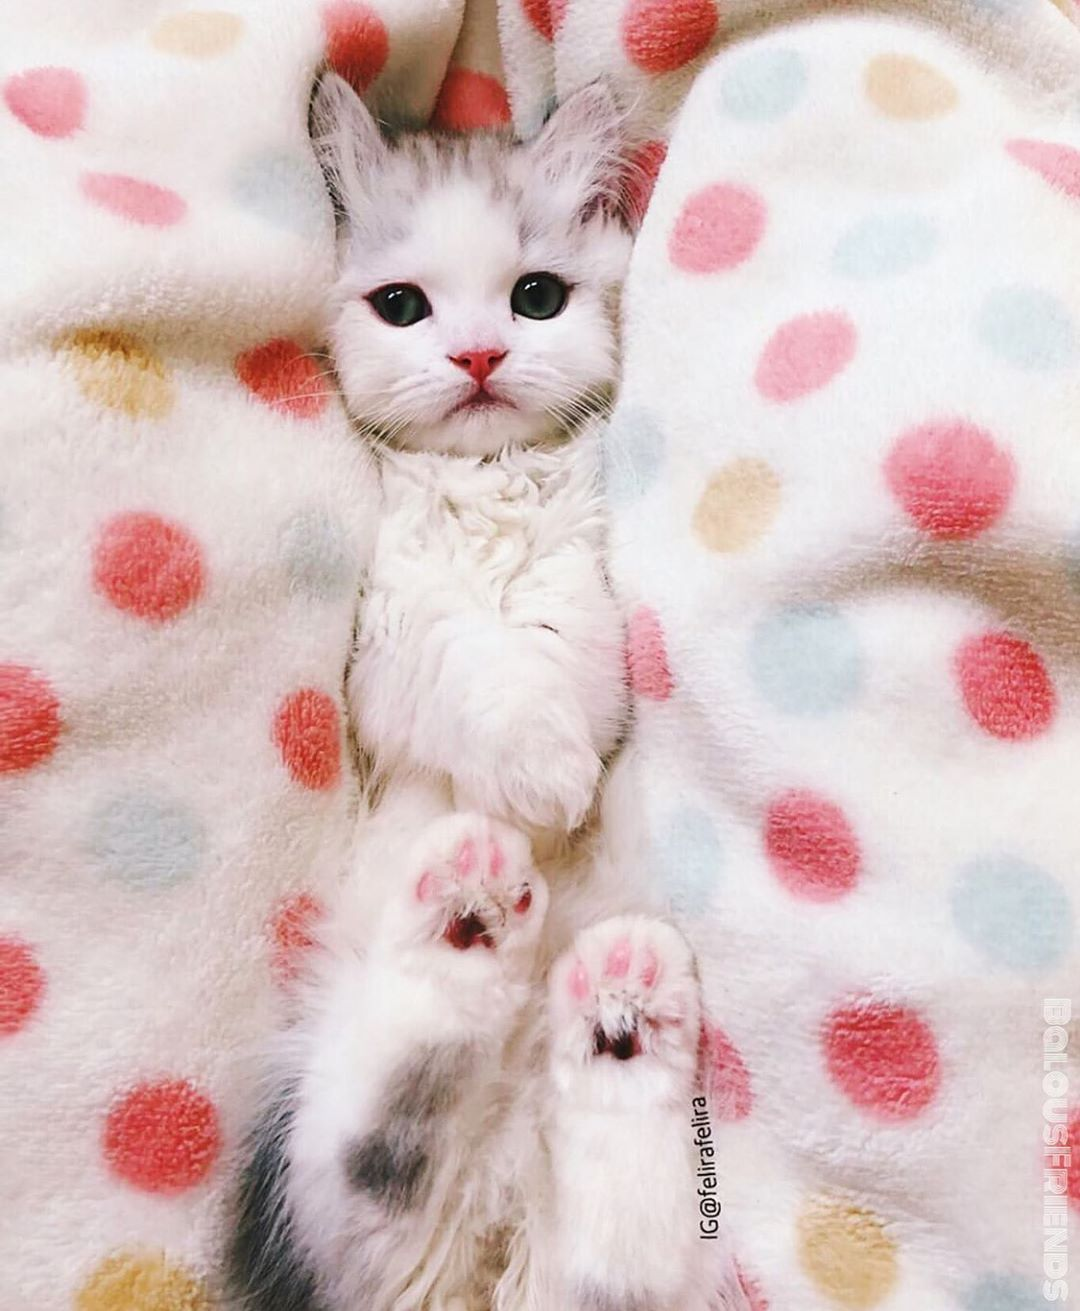 7 499 Begenme 76 Yorum Instagram Da Cats Catfeatures Balous Friends Luu Photo By Felirafelira C O N G In 2020 Cute Cats Baby Cats Kittens Cutest